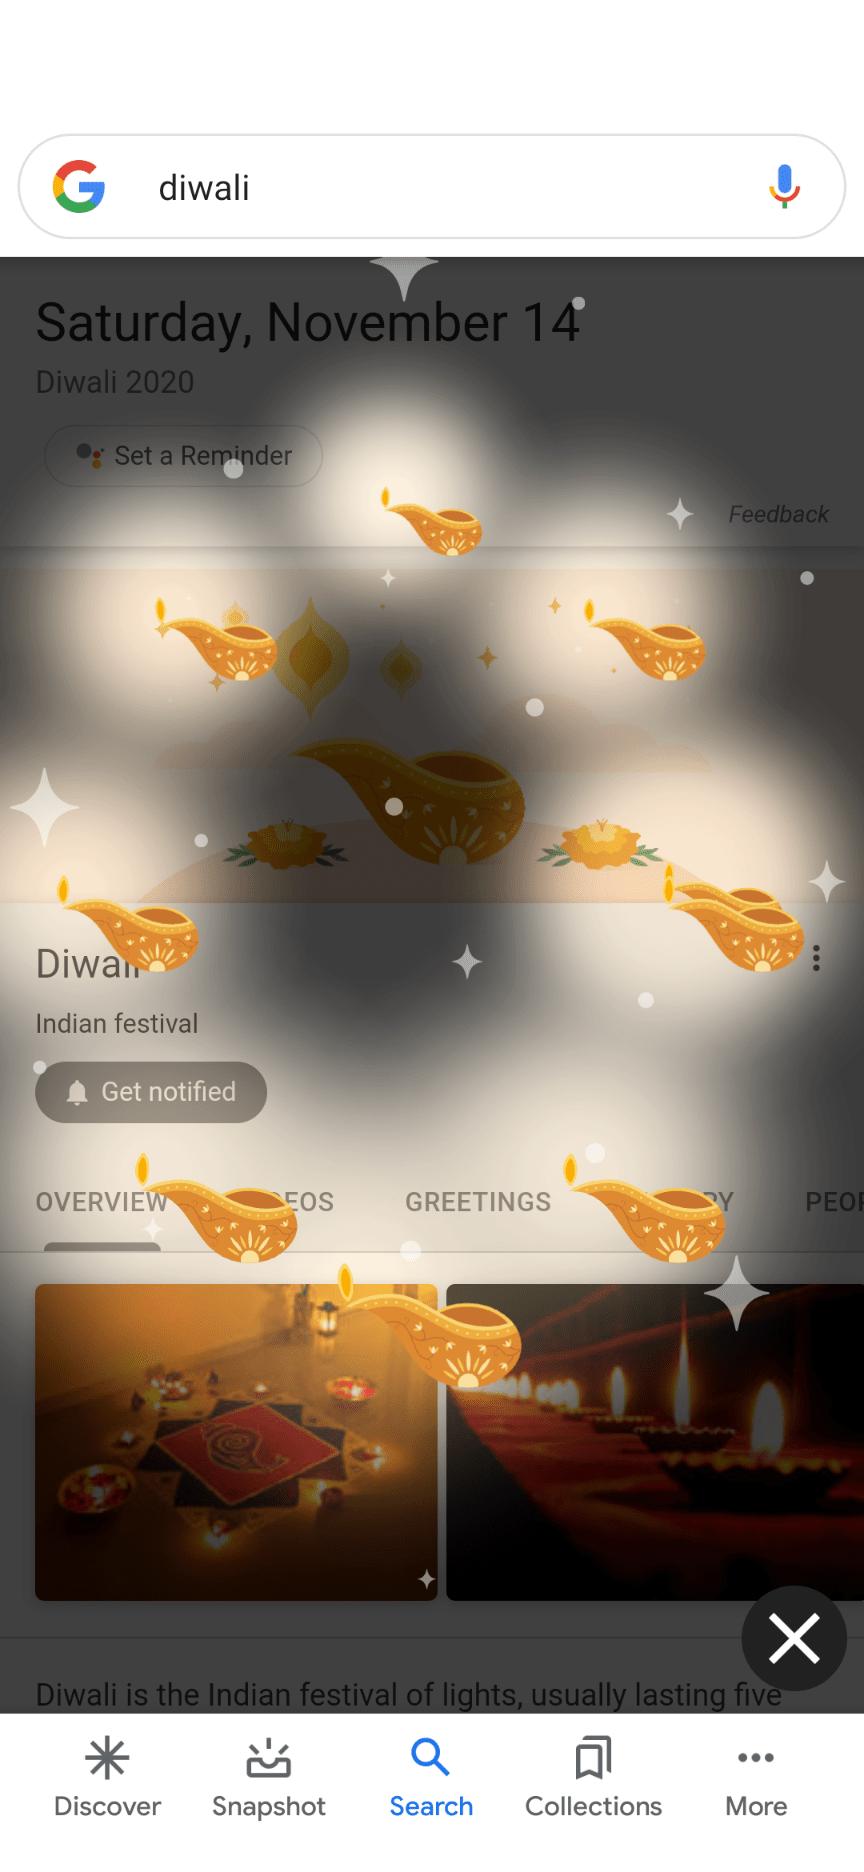 Google Search Diwali 2020 easter egg